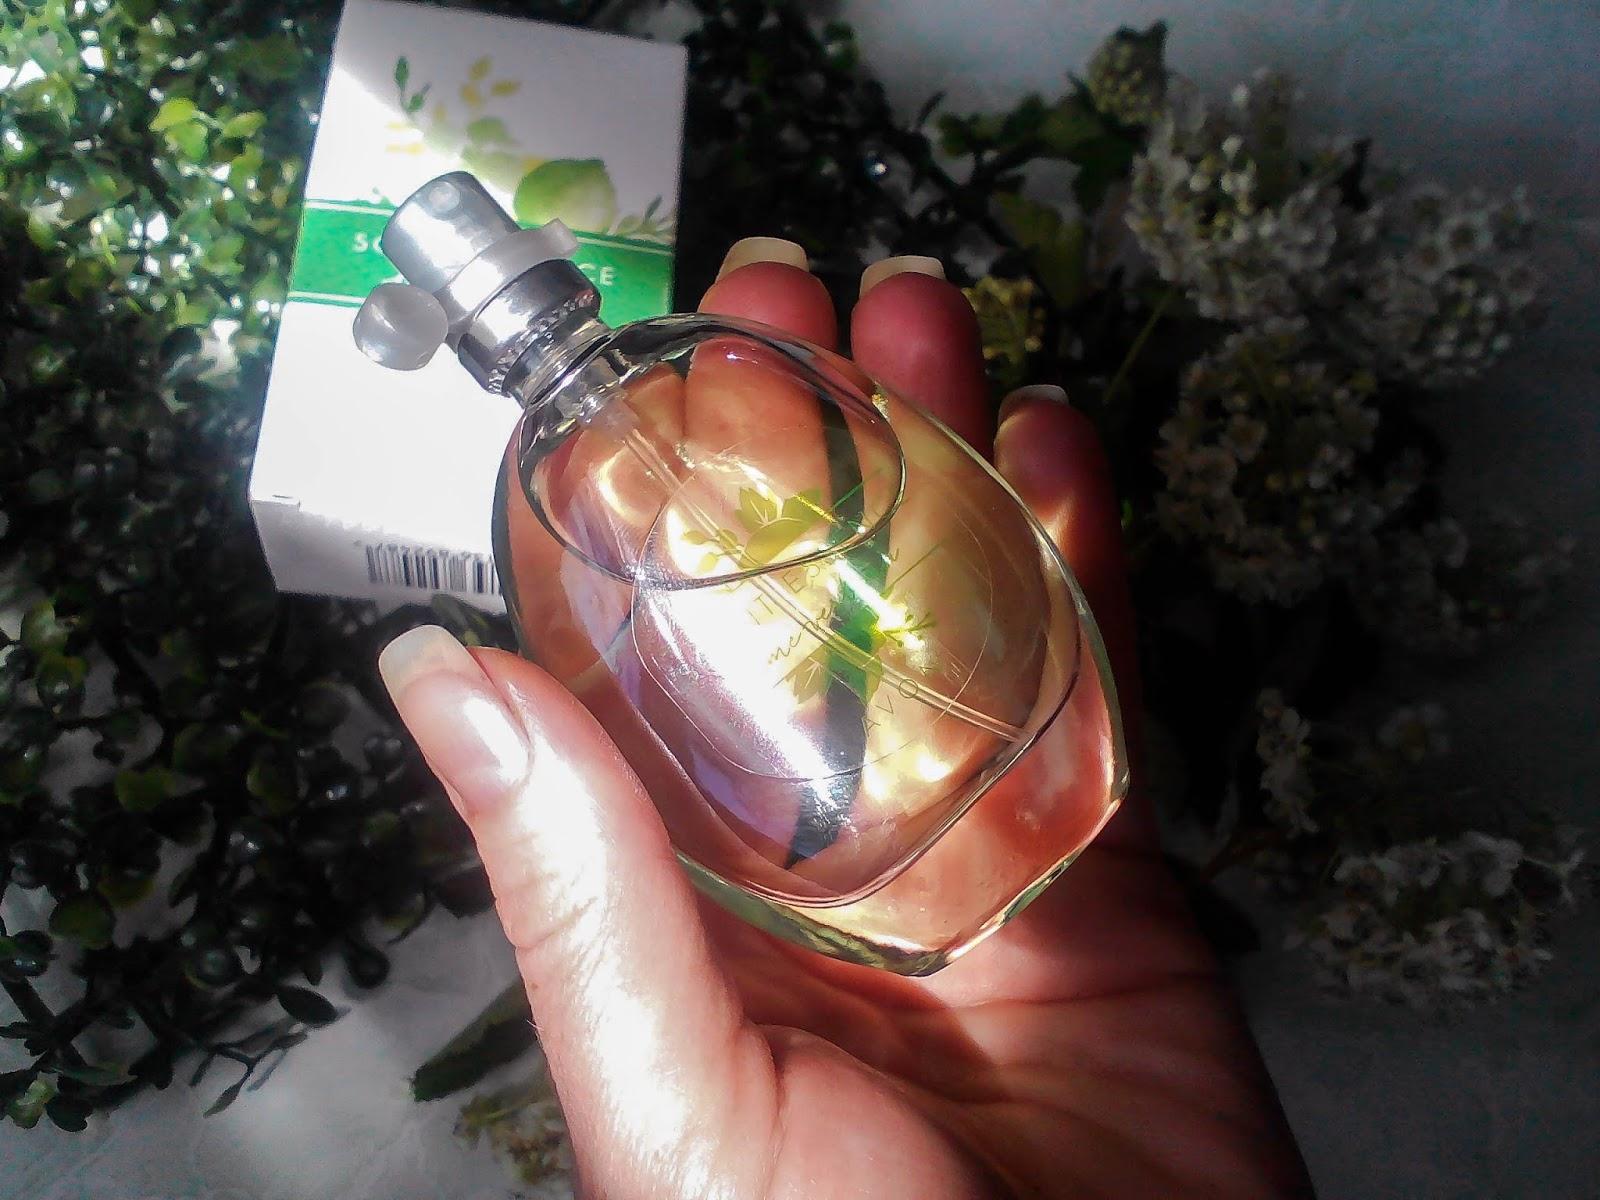 Ogromny Освежающий лимонад - Avon Scent Essence Lime Verbena. ST27